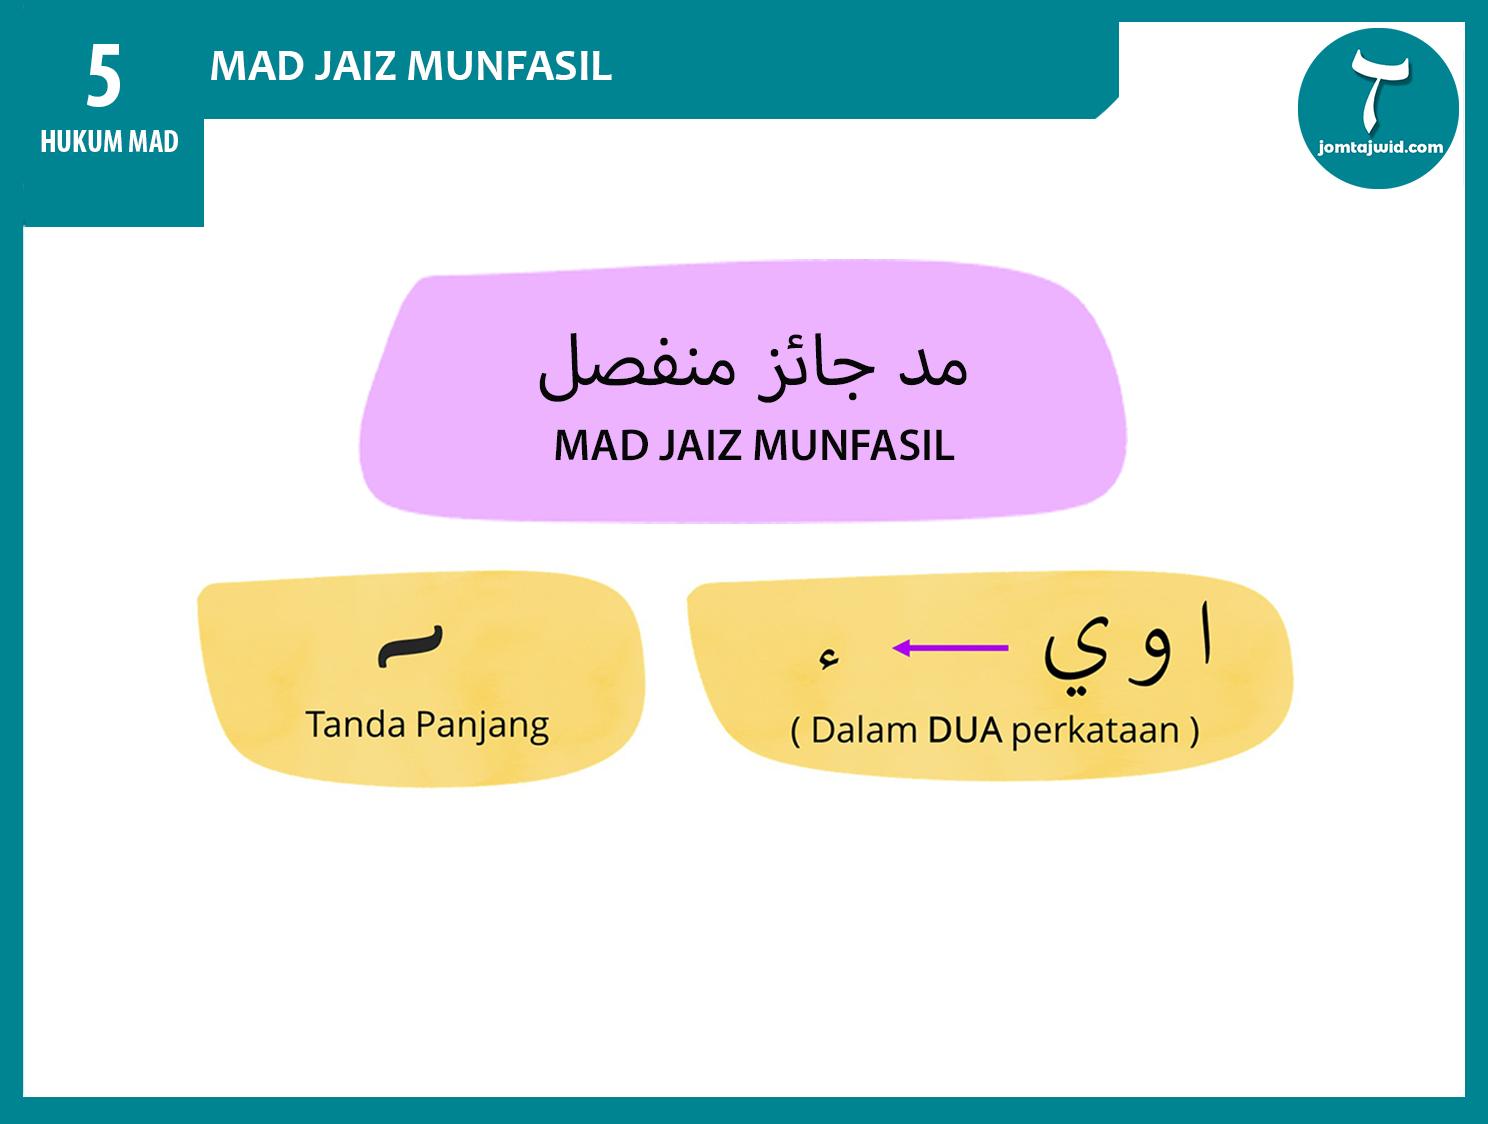 JomTajwid - Hukum mad jaiz munfasil 4 (Feature) new 2